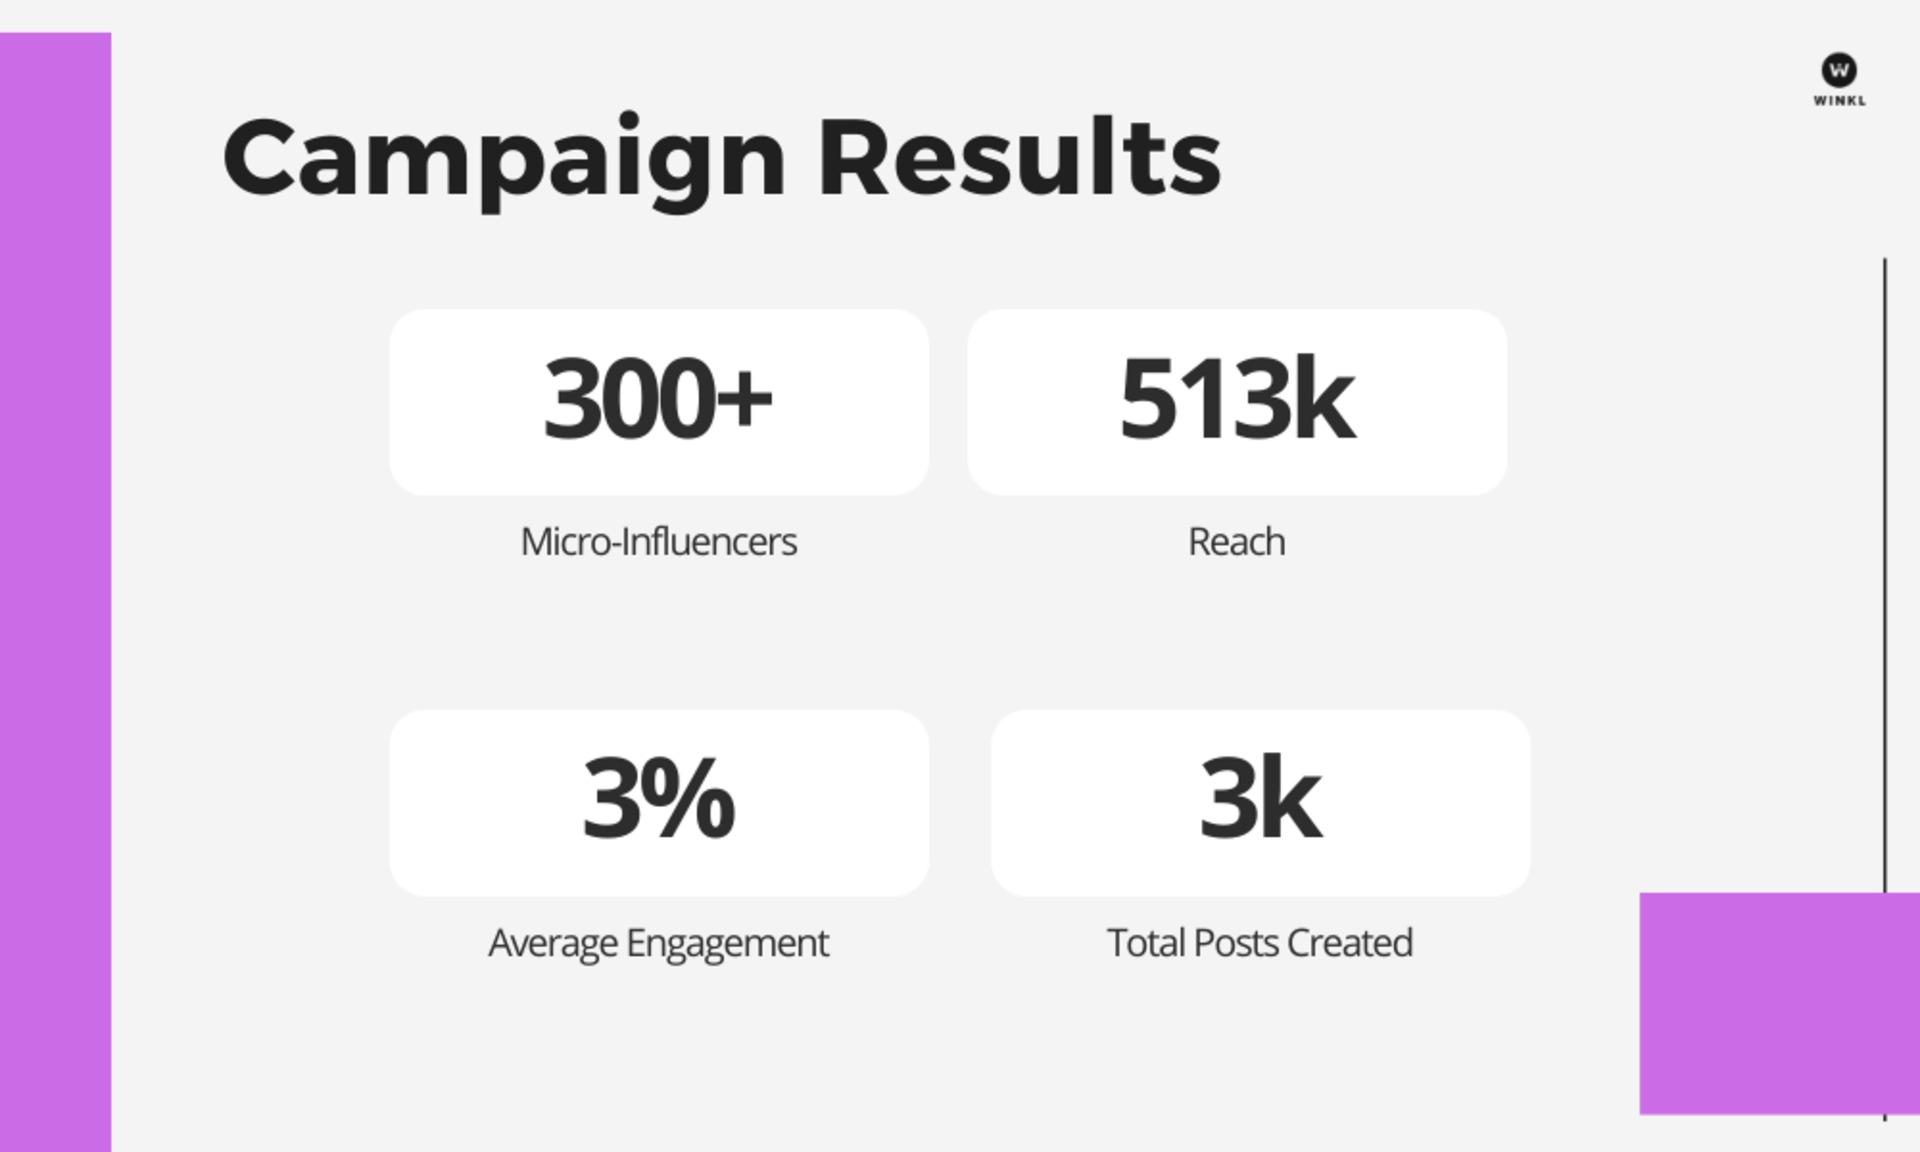 Winkl on Influencer Marketing - Copy of Go Study Case Study